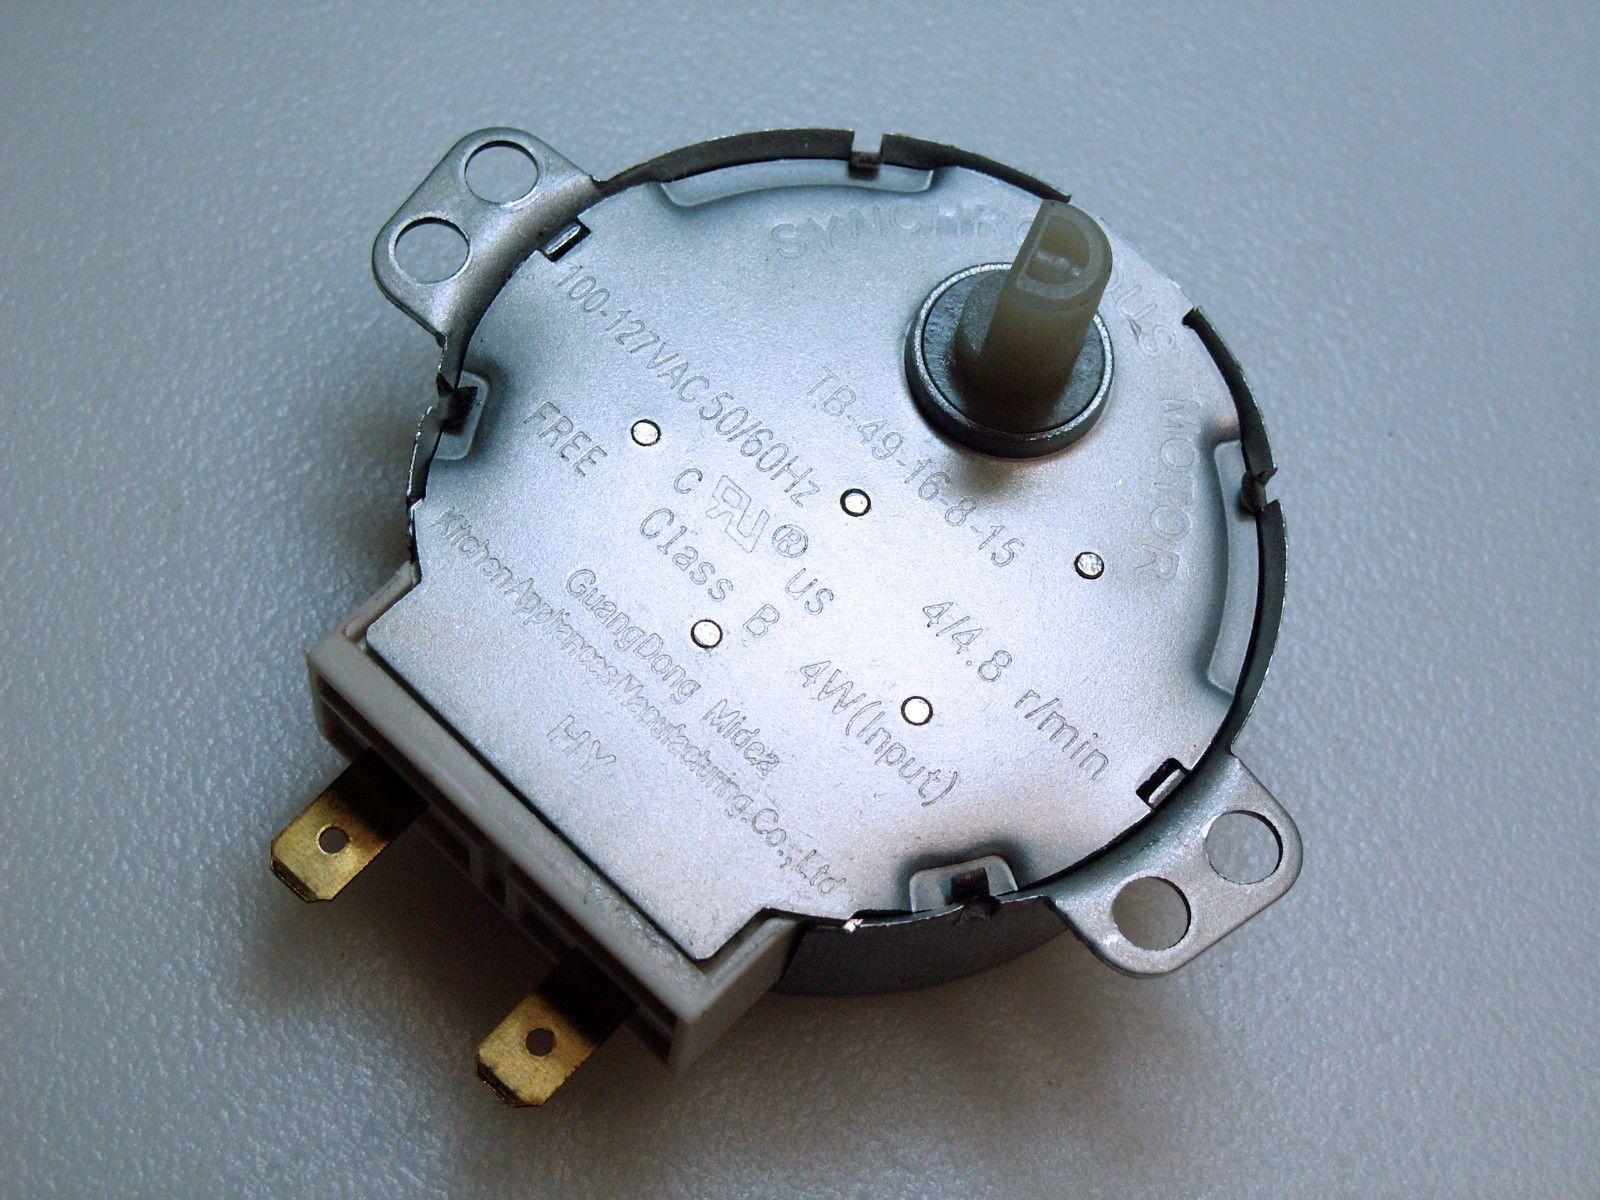 Genuine Frigidaire 5304408980 AP2151259 PS471476 Microwave Turntable Motor